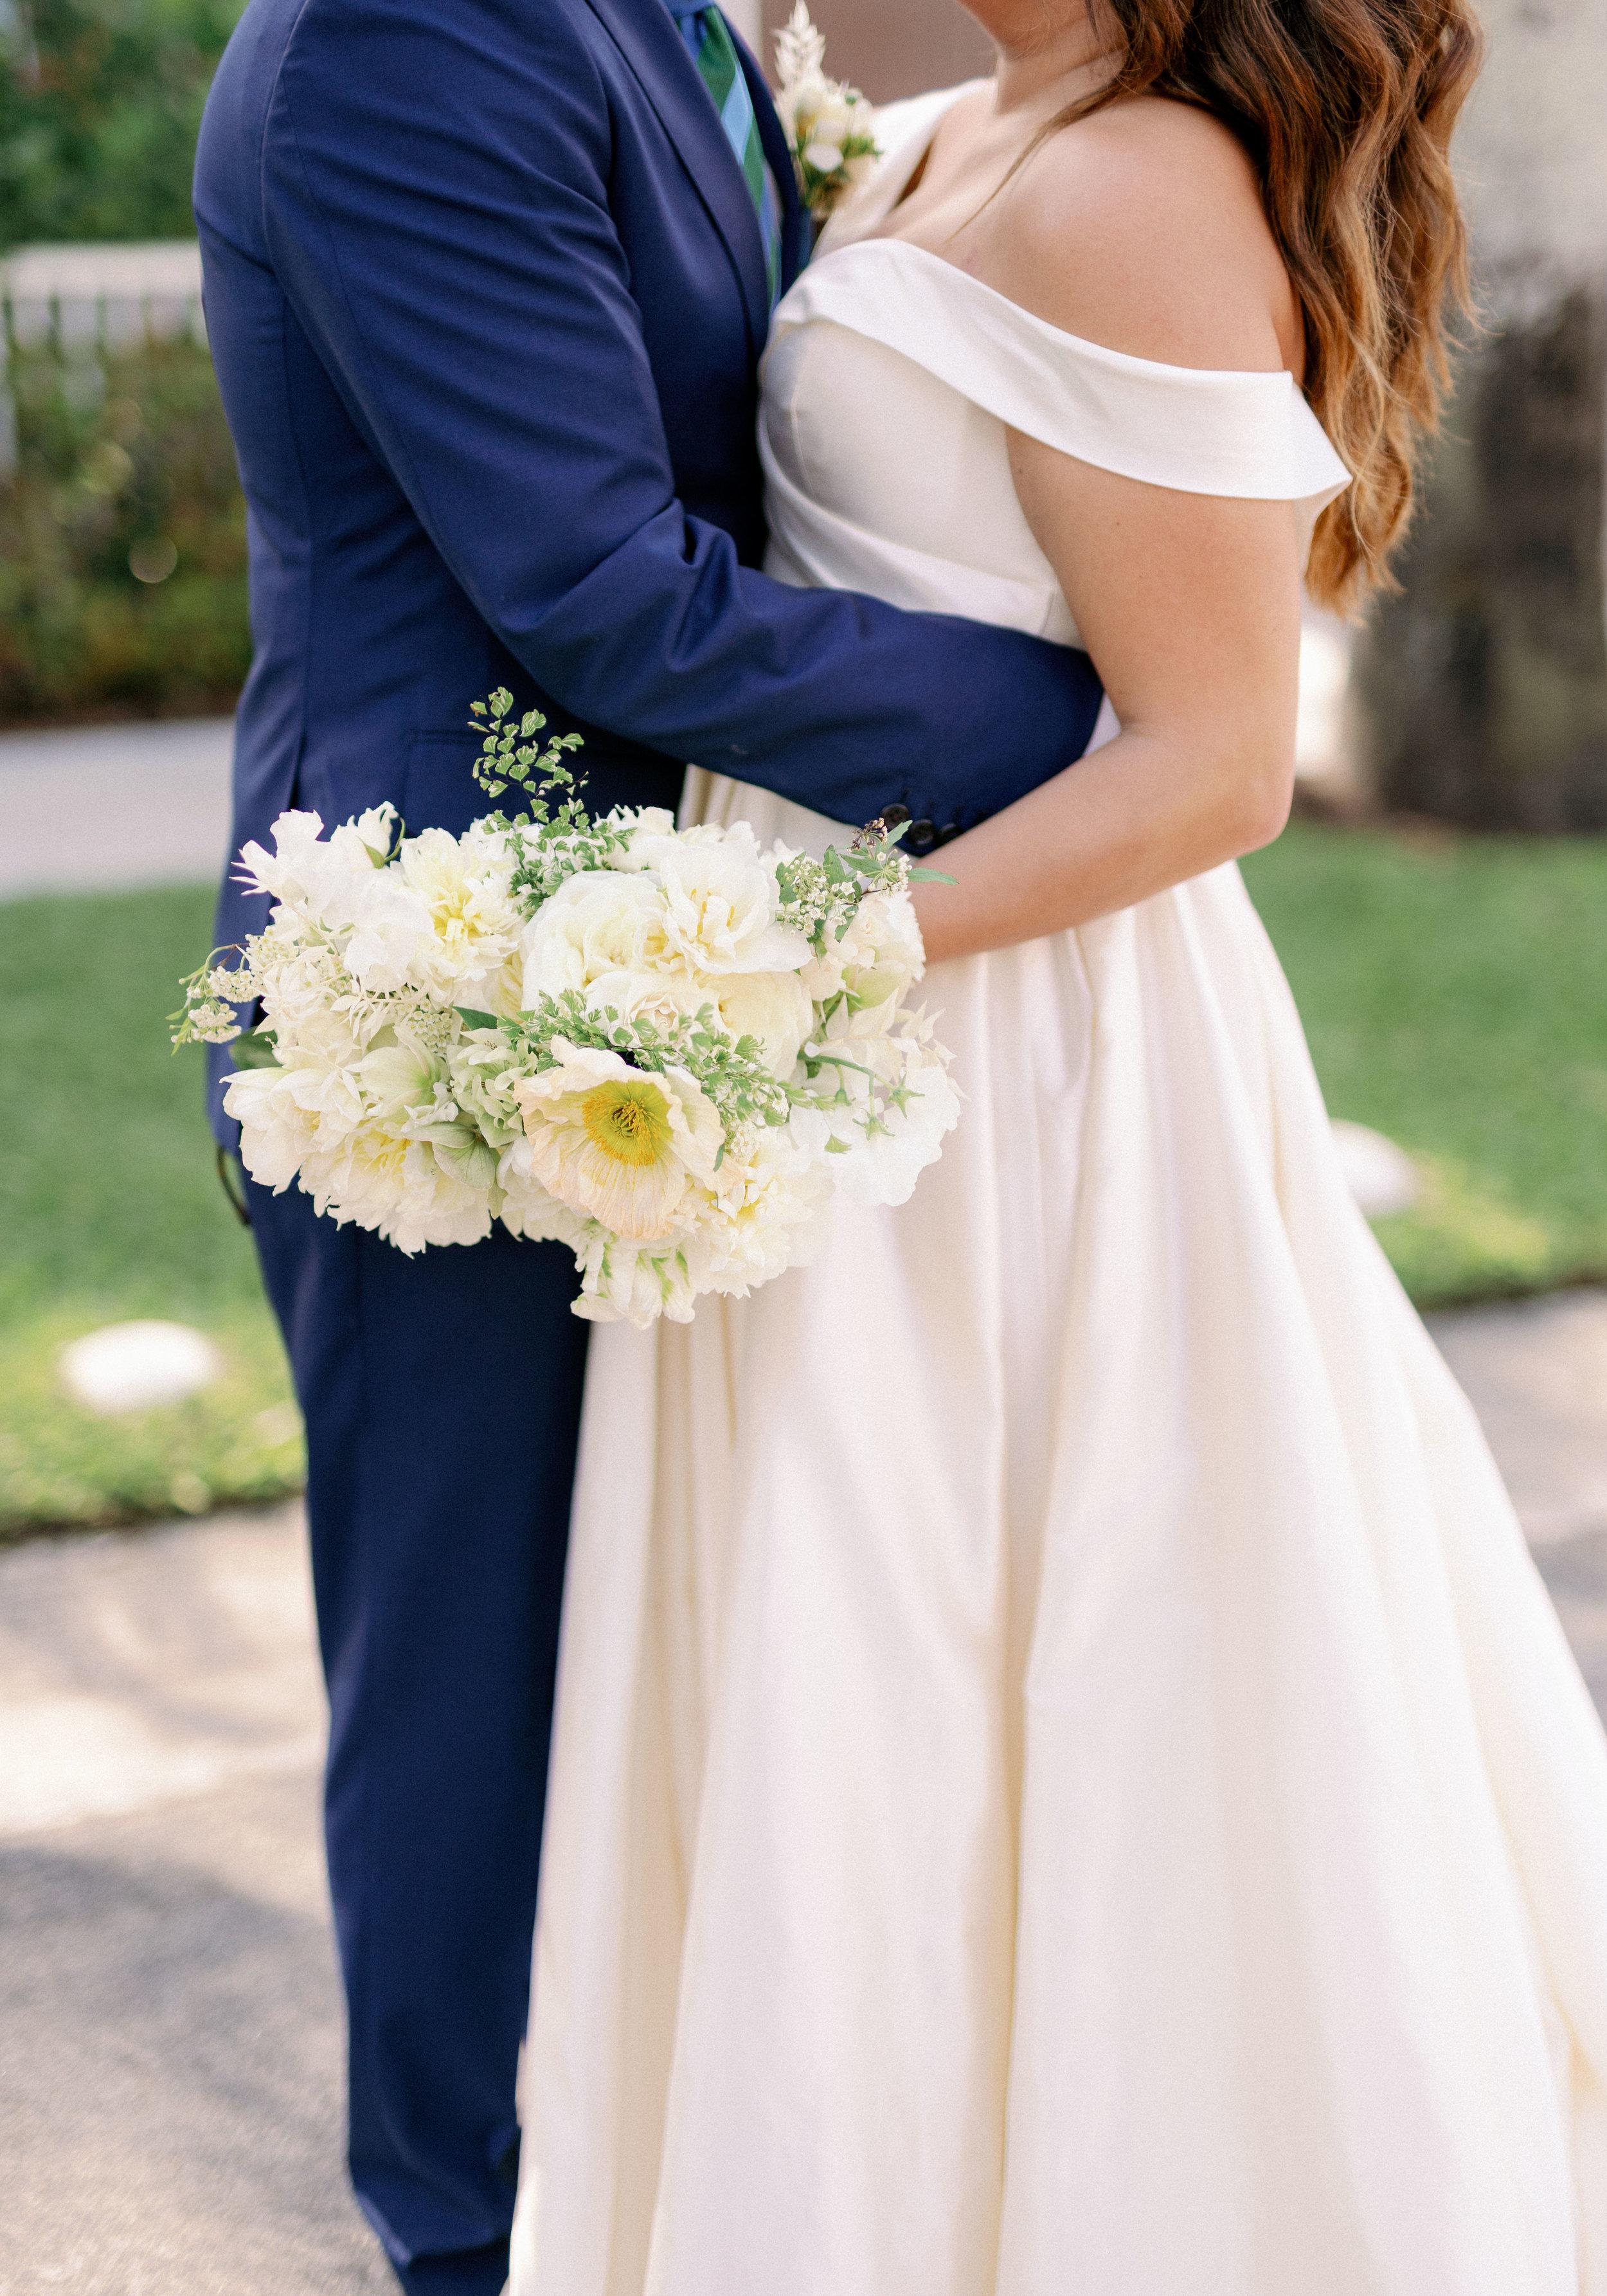 floral-bouquet-wedding.jpg